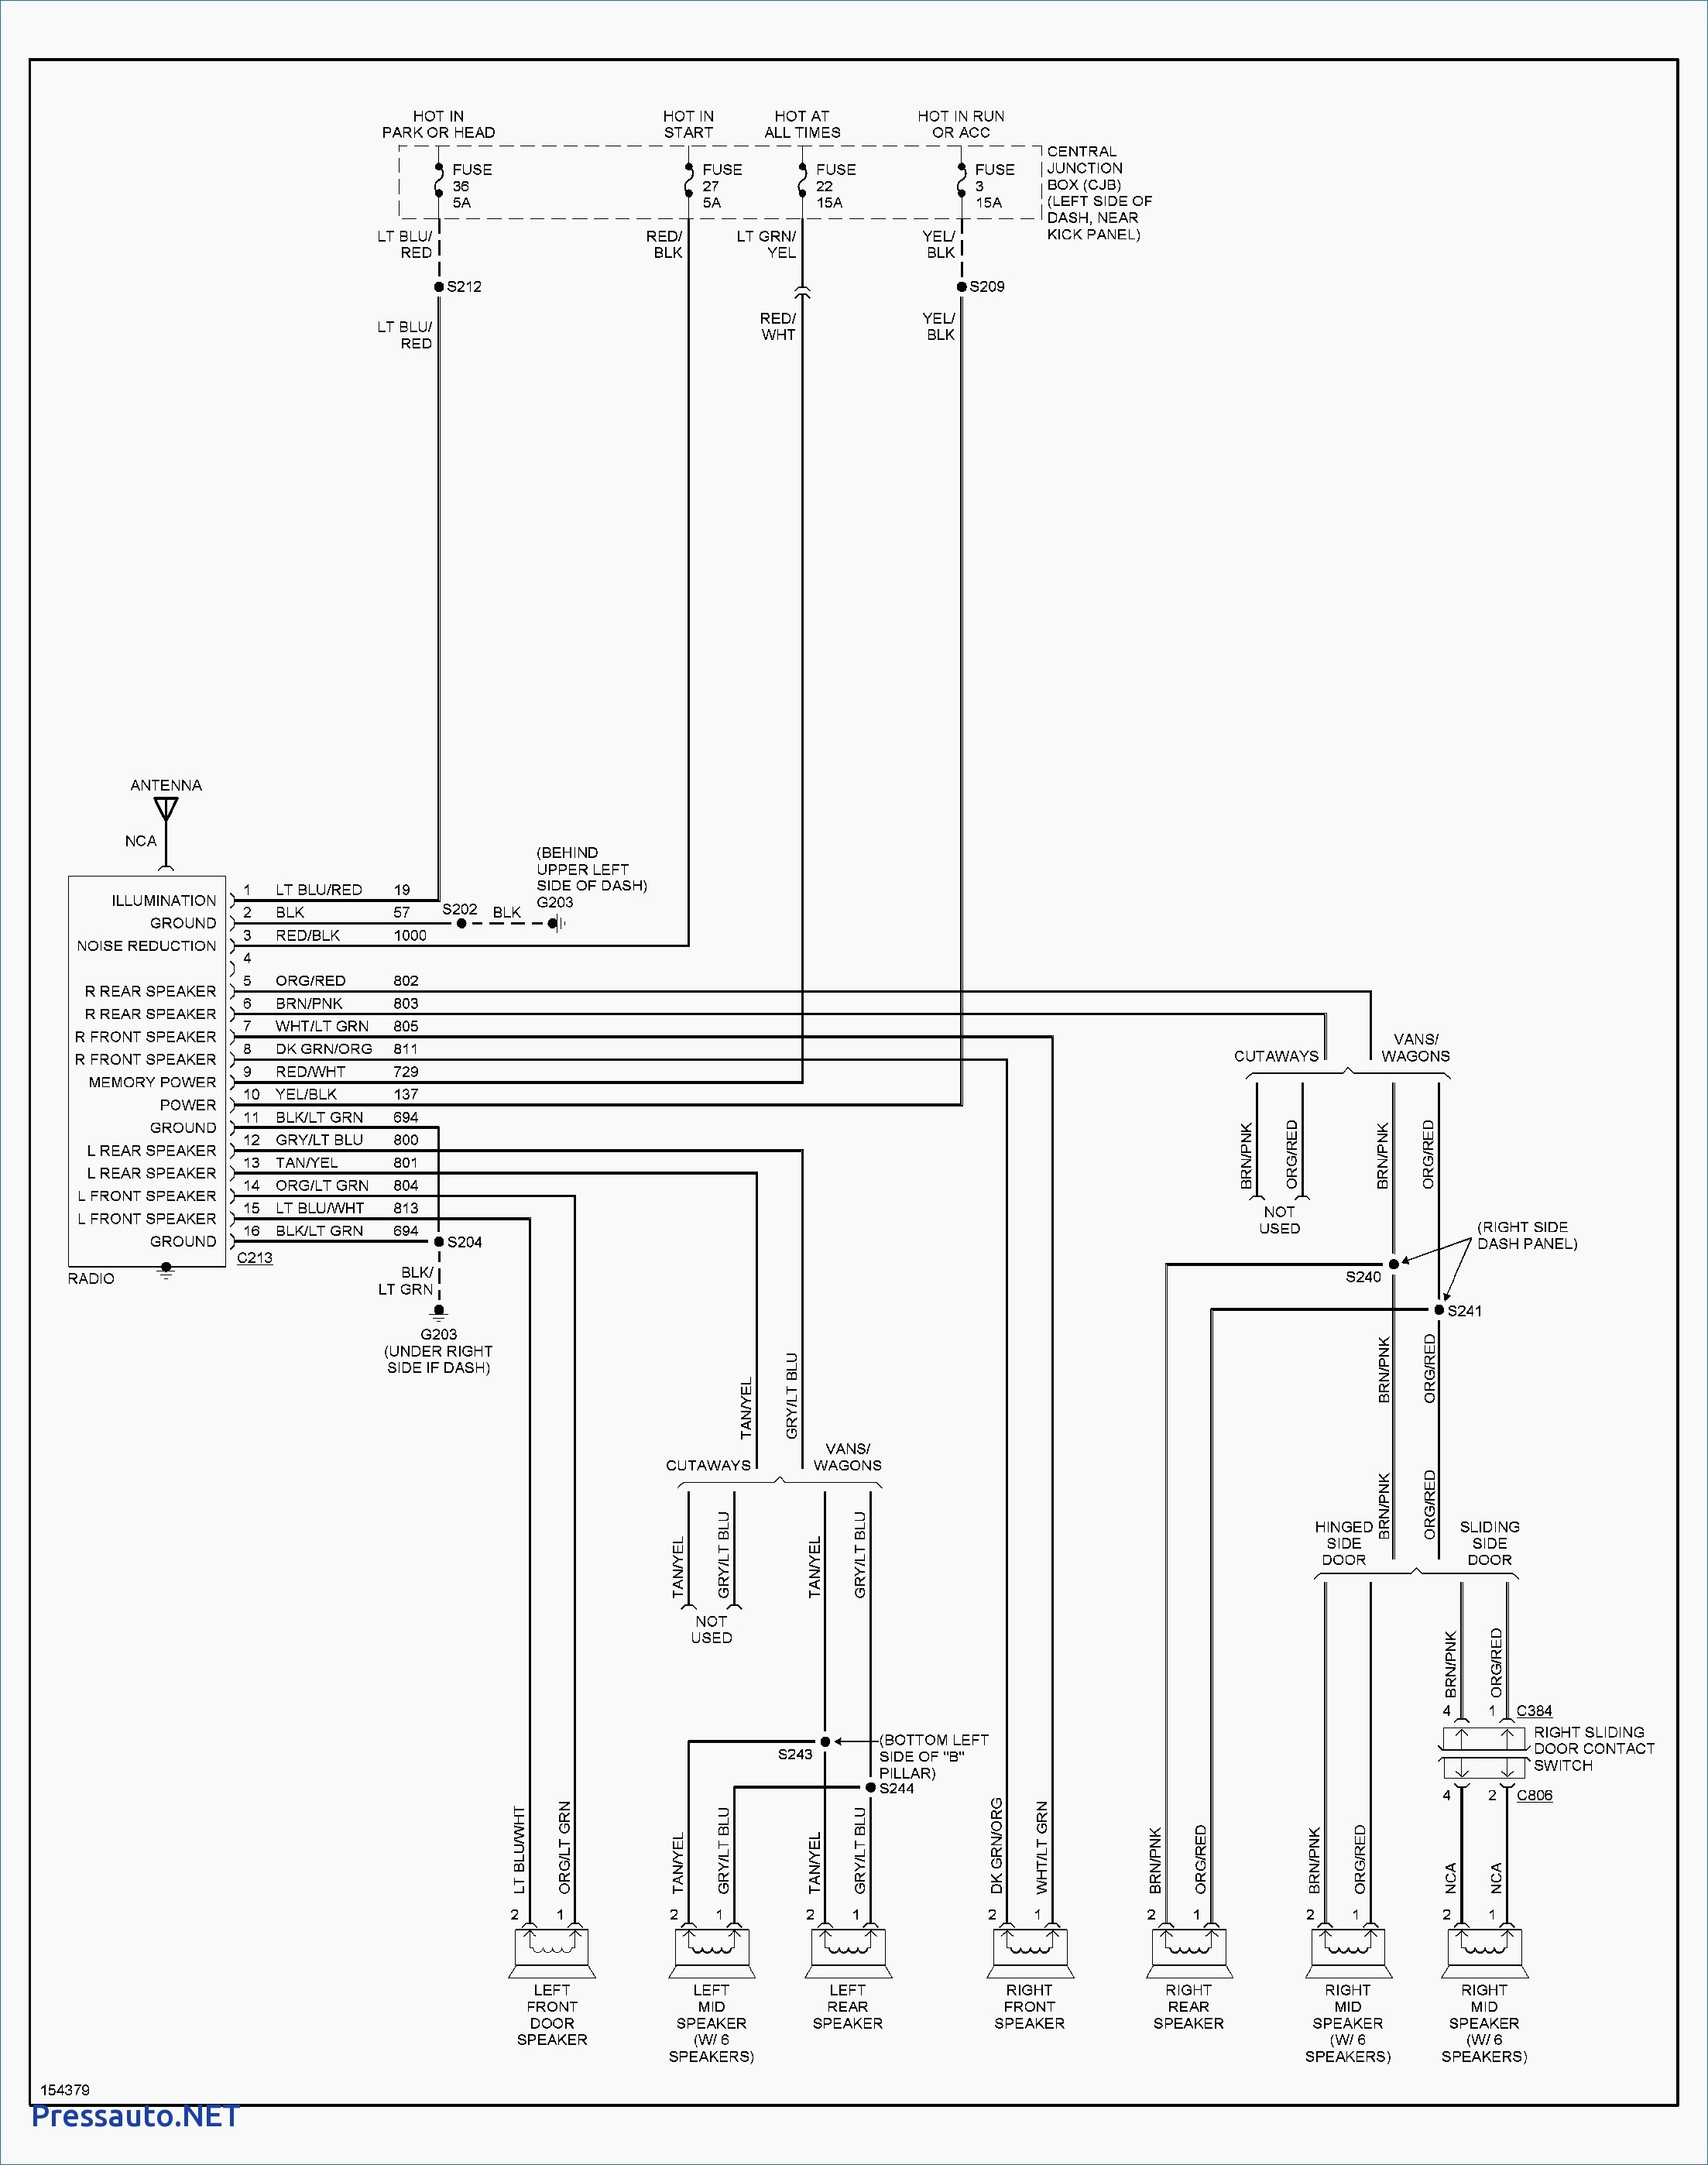 2002 ford F250 Radio Wiring Diagram 1999 ford Ranger Wiring Diagram and 2004 to Wiring Diagram Of 2002 ford F250 Radio Wiring Diagram